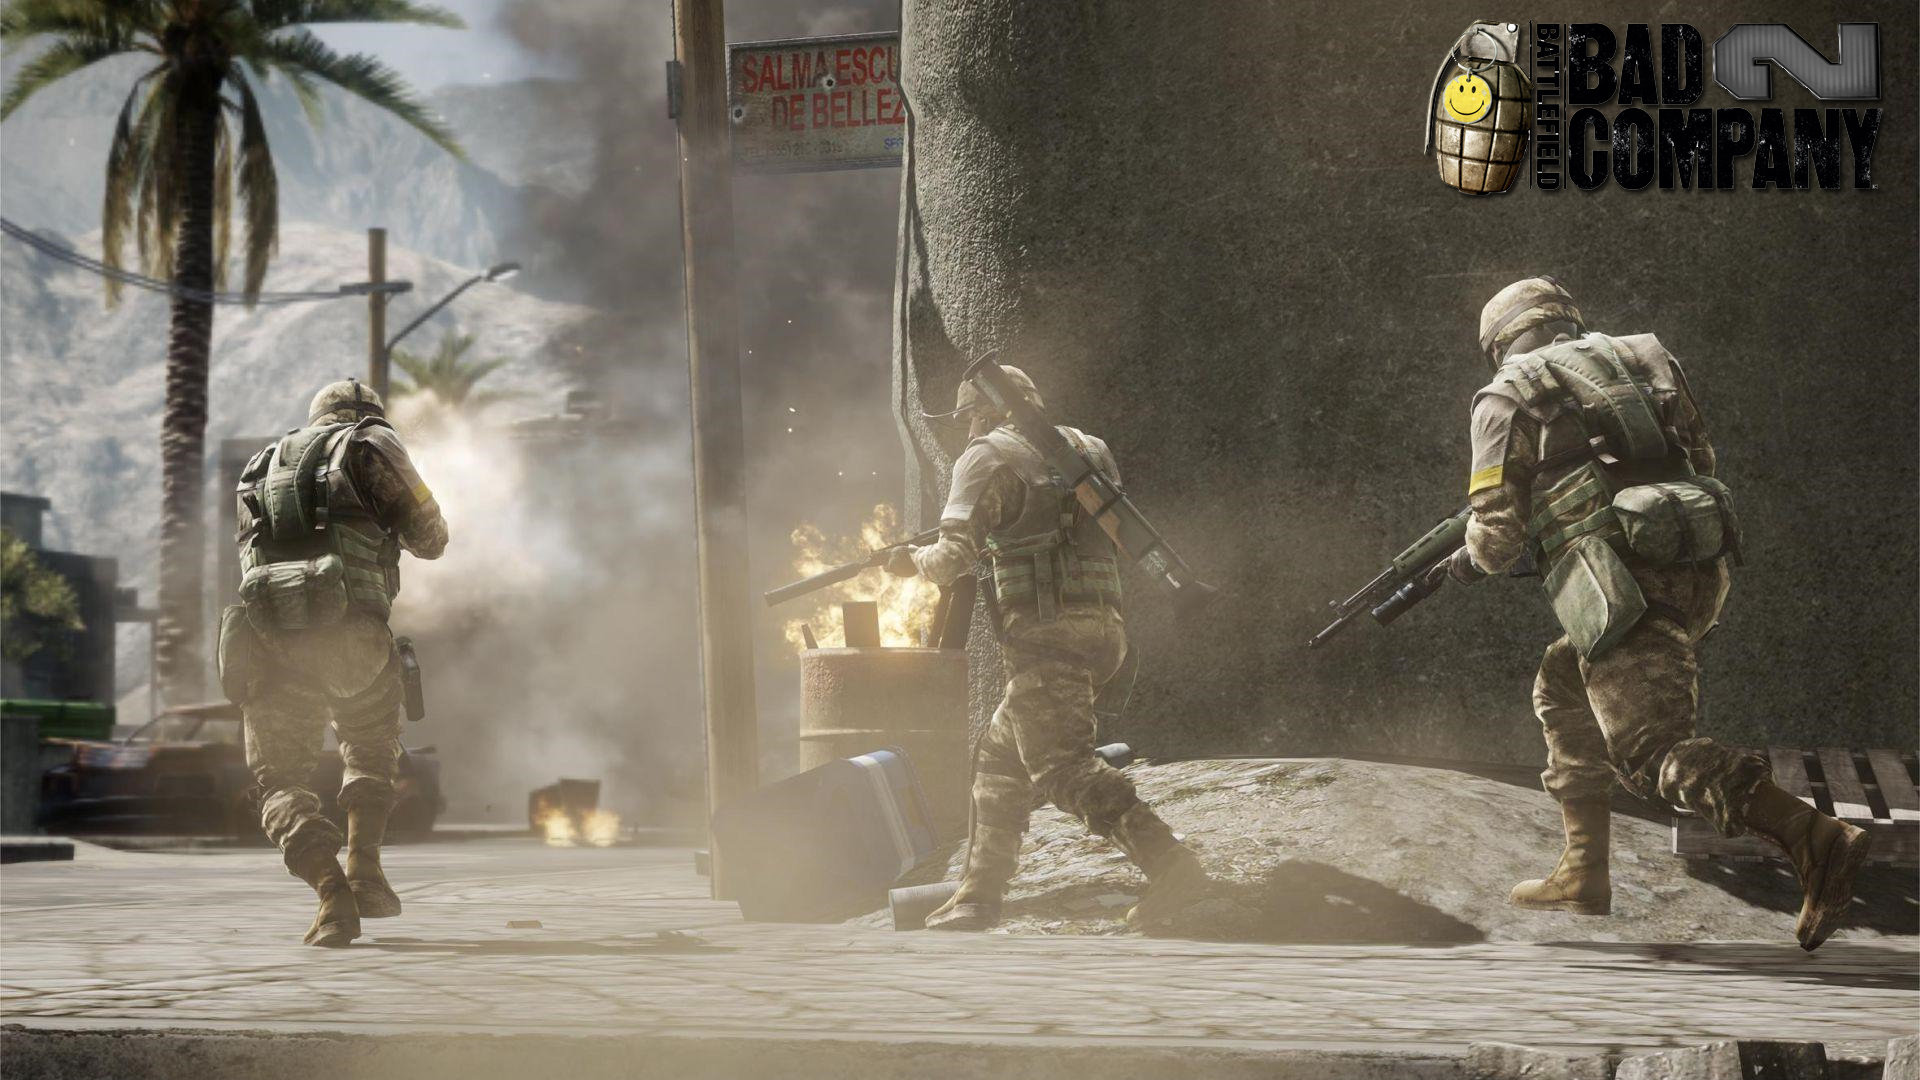 Battlefield Bad Company 2 Wallpapers Hd For Desktop Backgrounds